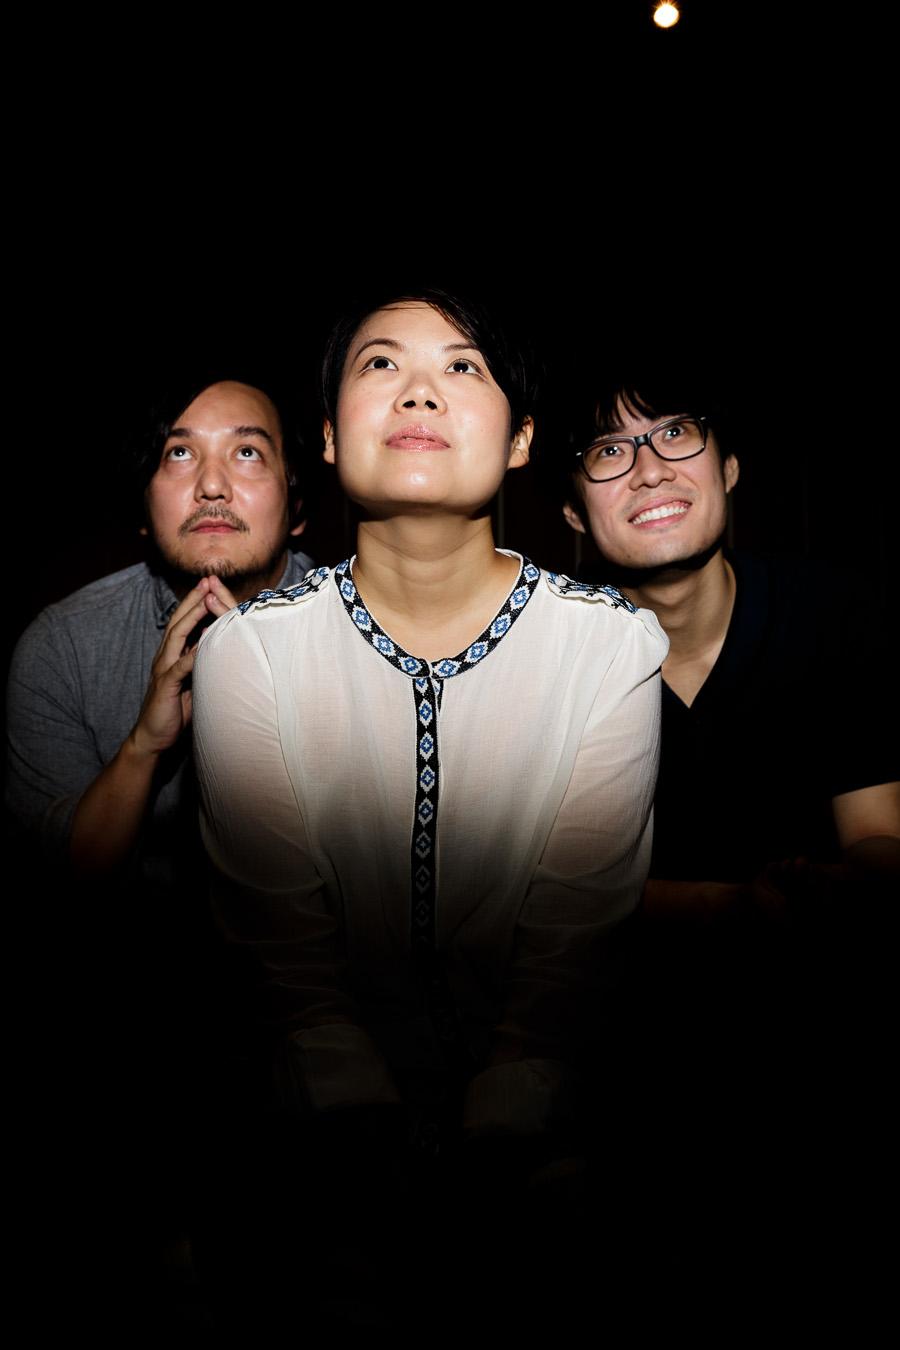 Lee Chatametikool, Anocha Suwichakornpong and Nawapol Thamrongrattanarit